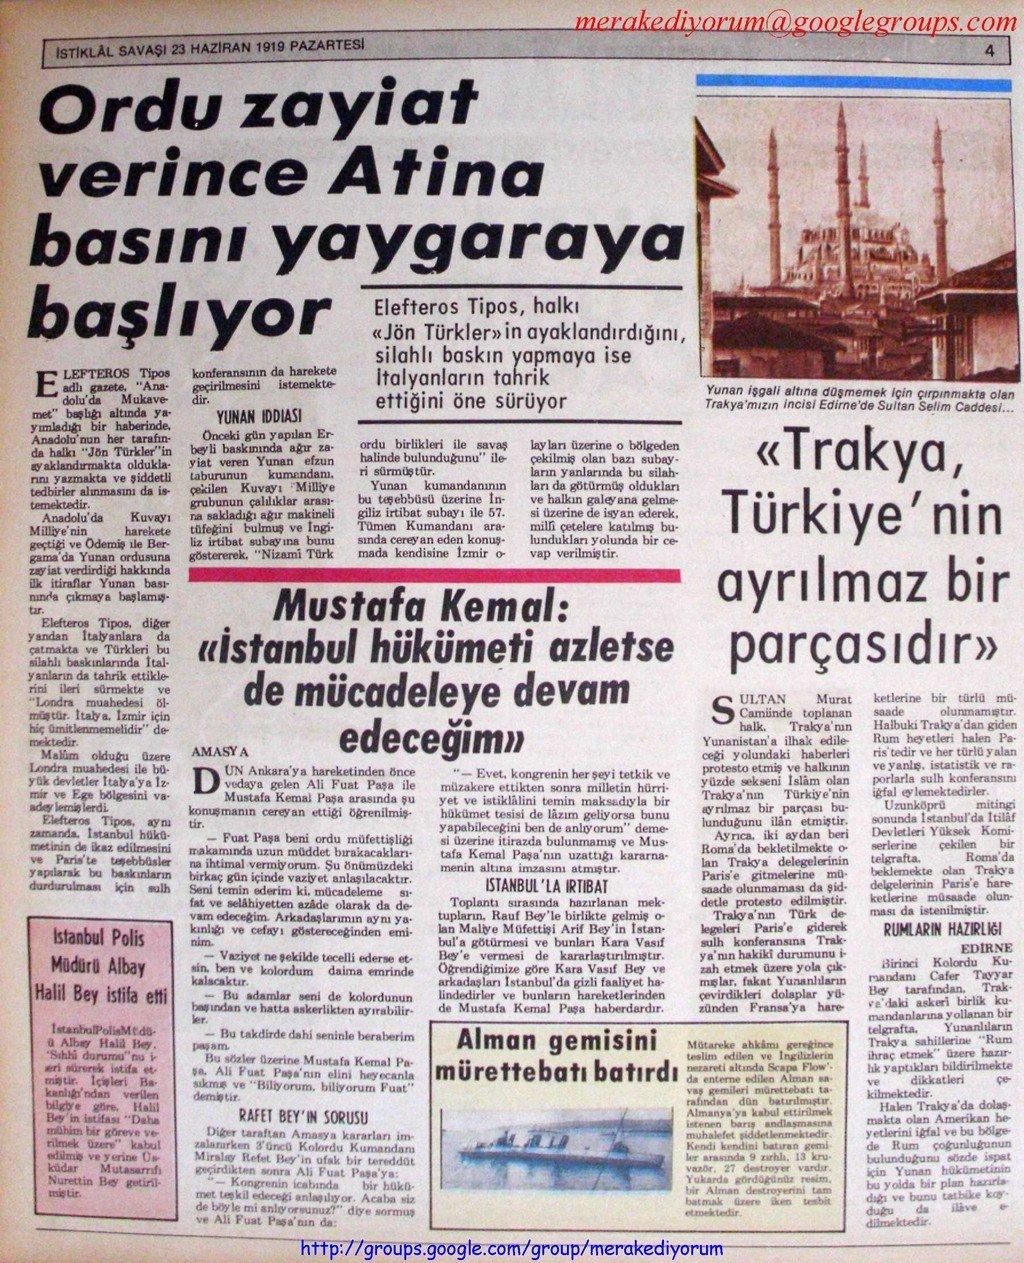 istiklal savaşı gazetesi - 23 haziran 1919